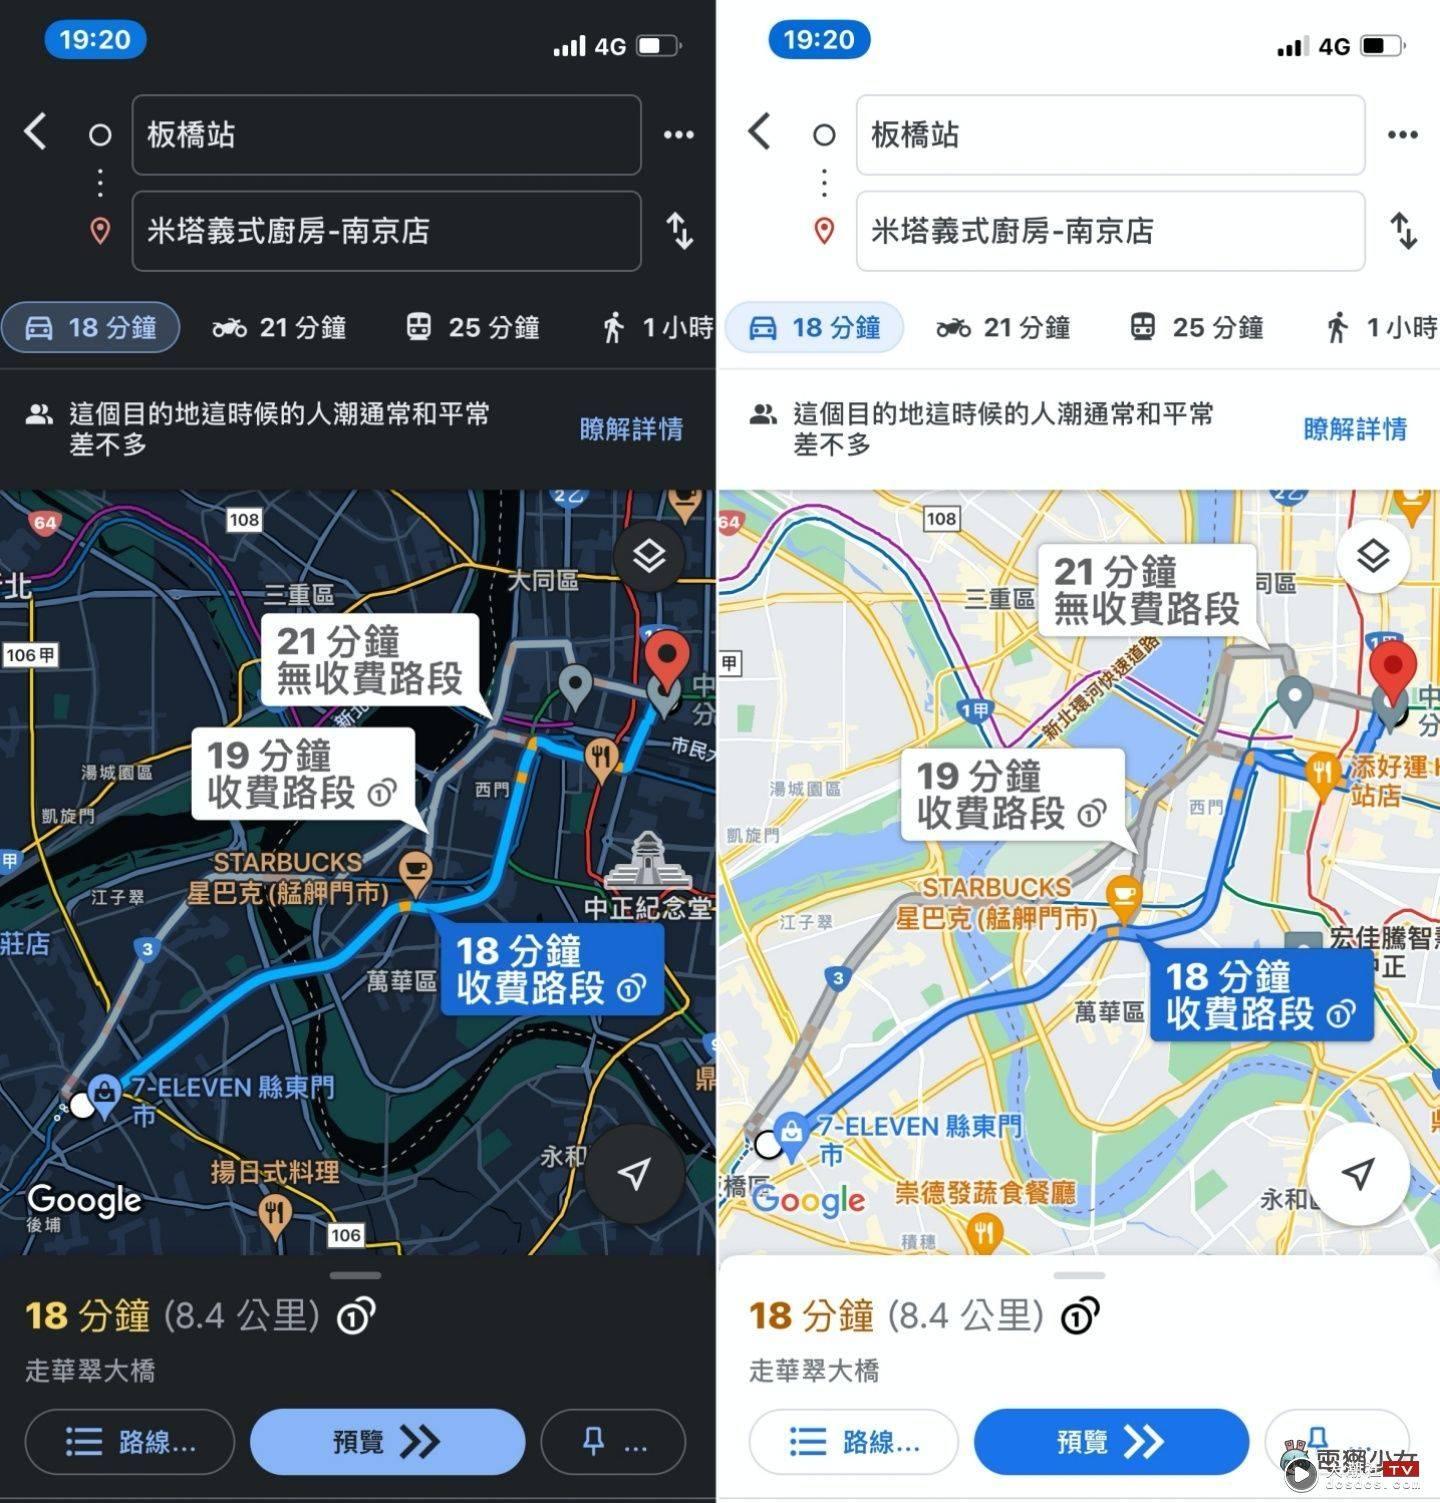 iOS 的 Google Maps 终于有' 深色模式 '了!如何设定开启一次看!同场加映 3 个的实用小技巧